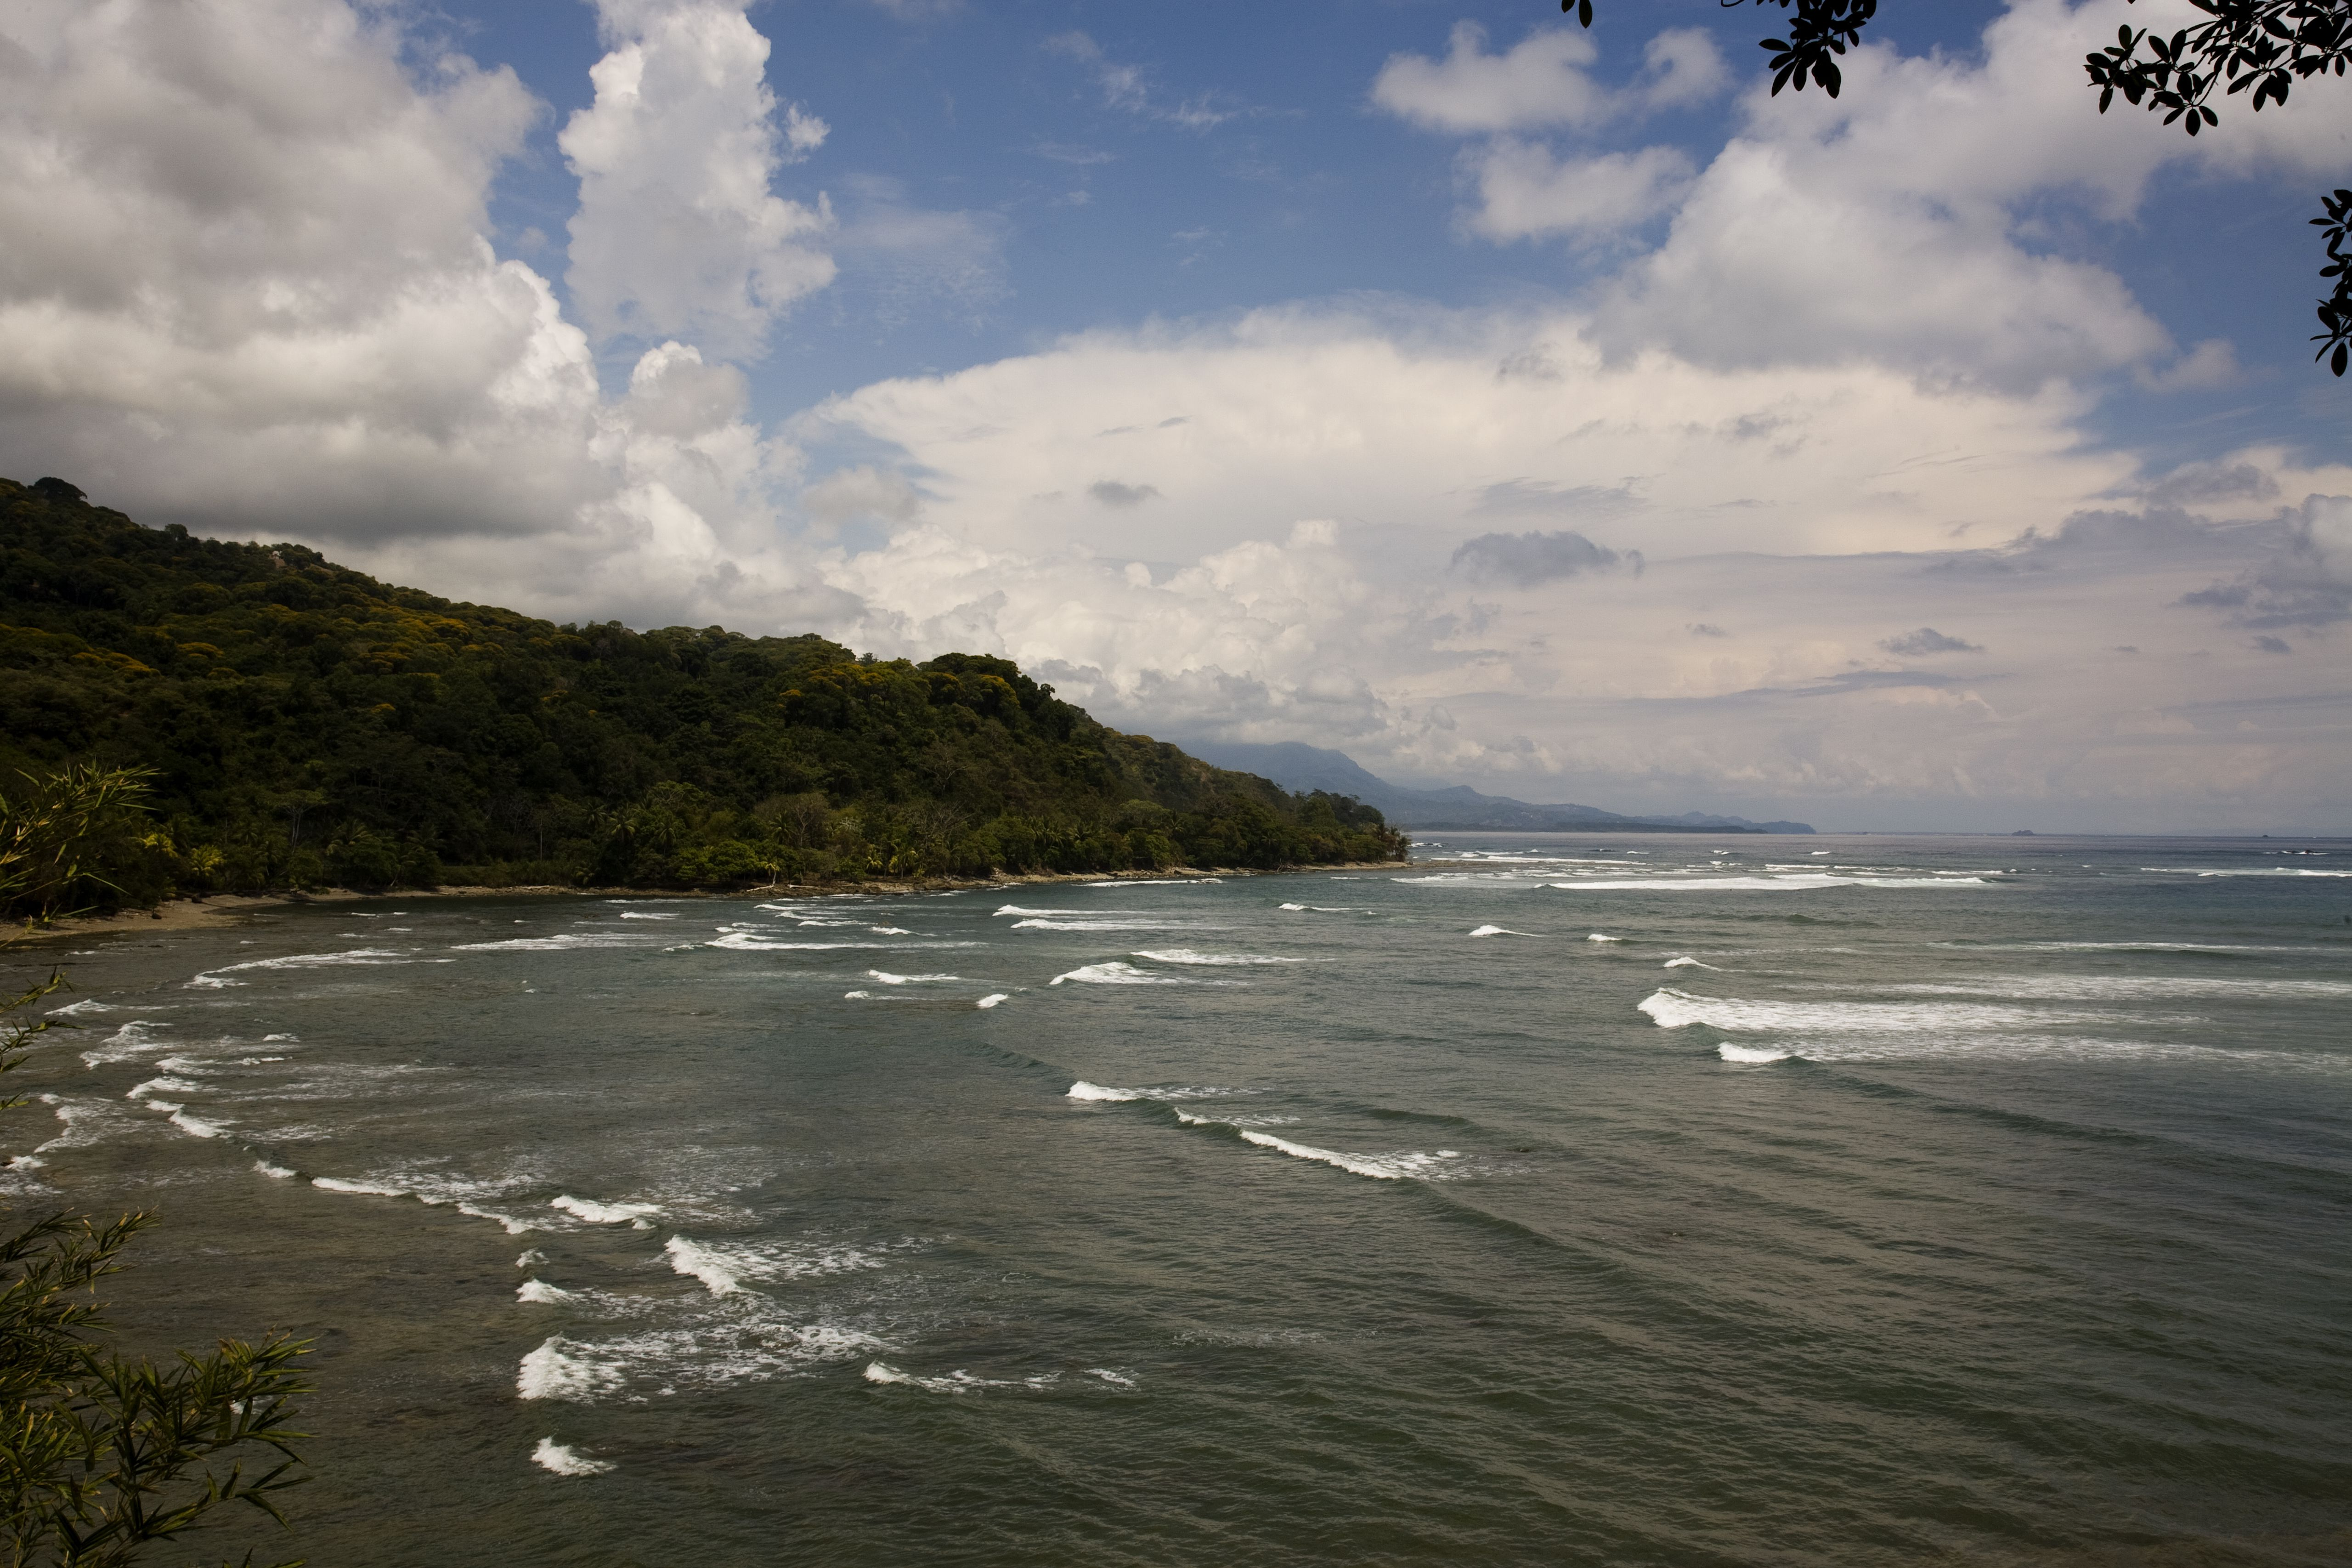 Sets of waves crash into a bay.